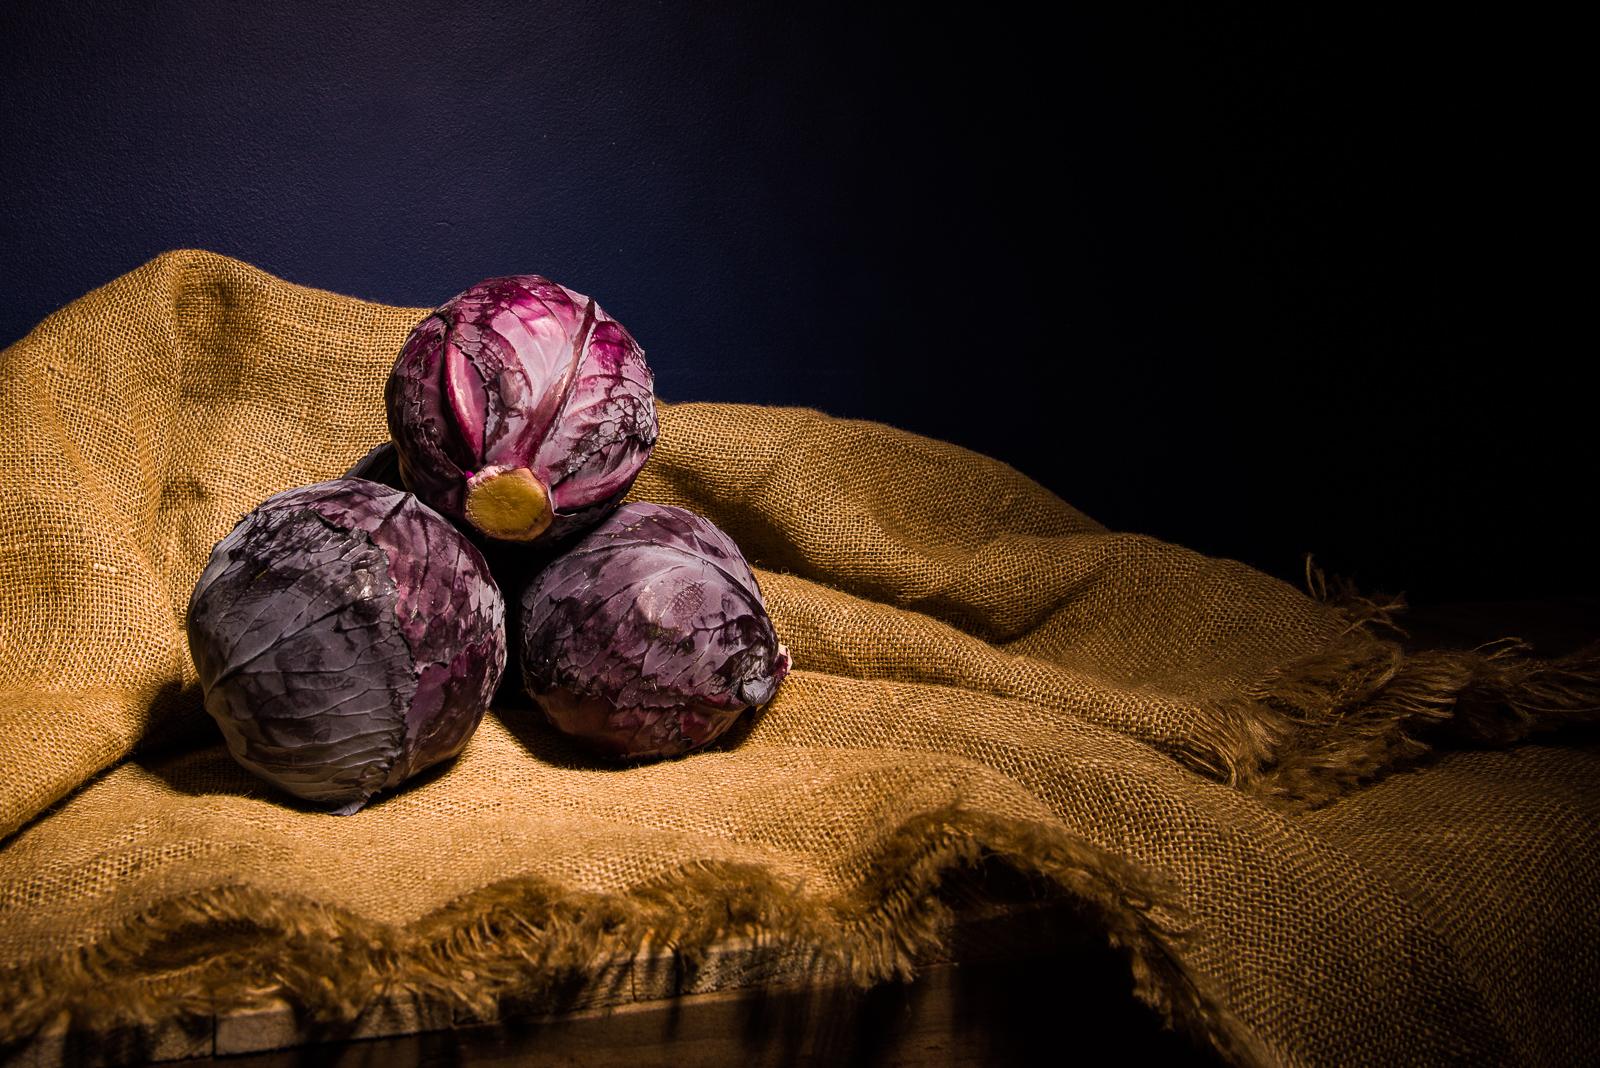 vegetables-3.jpg